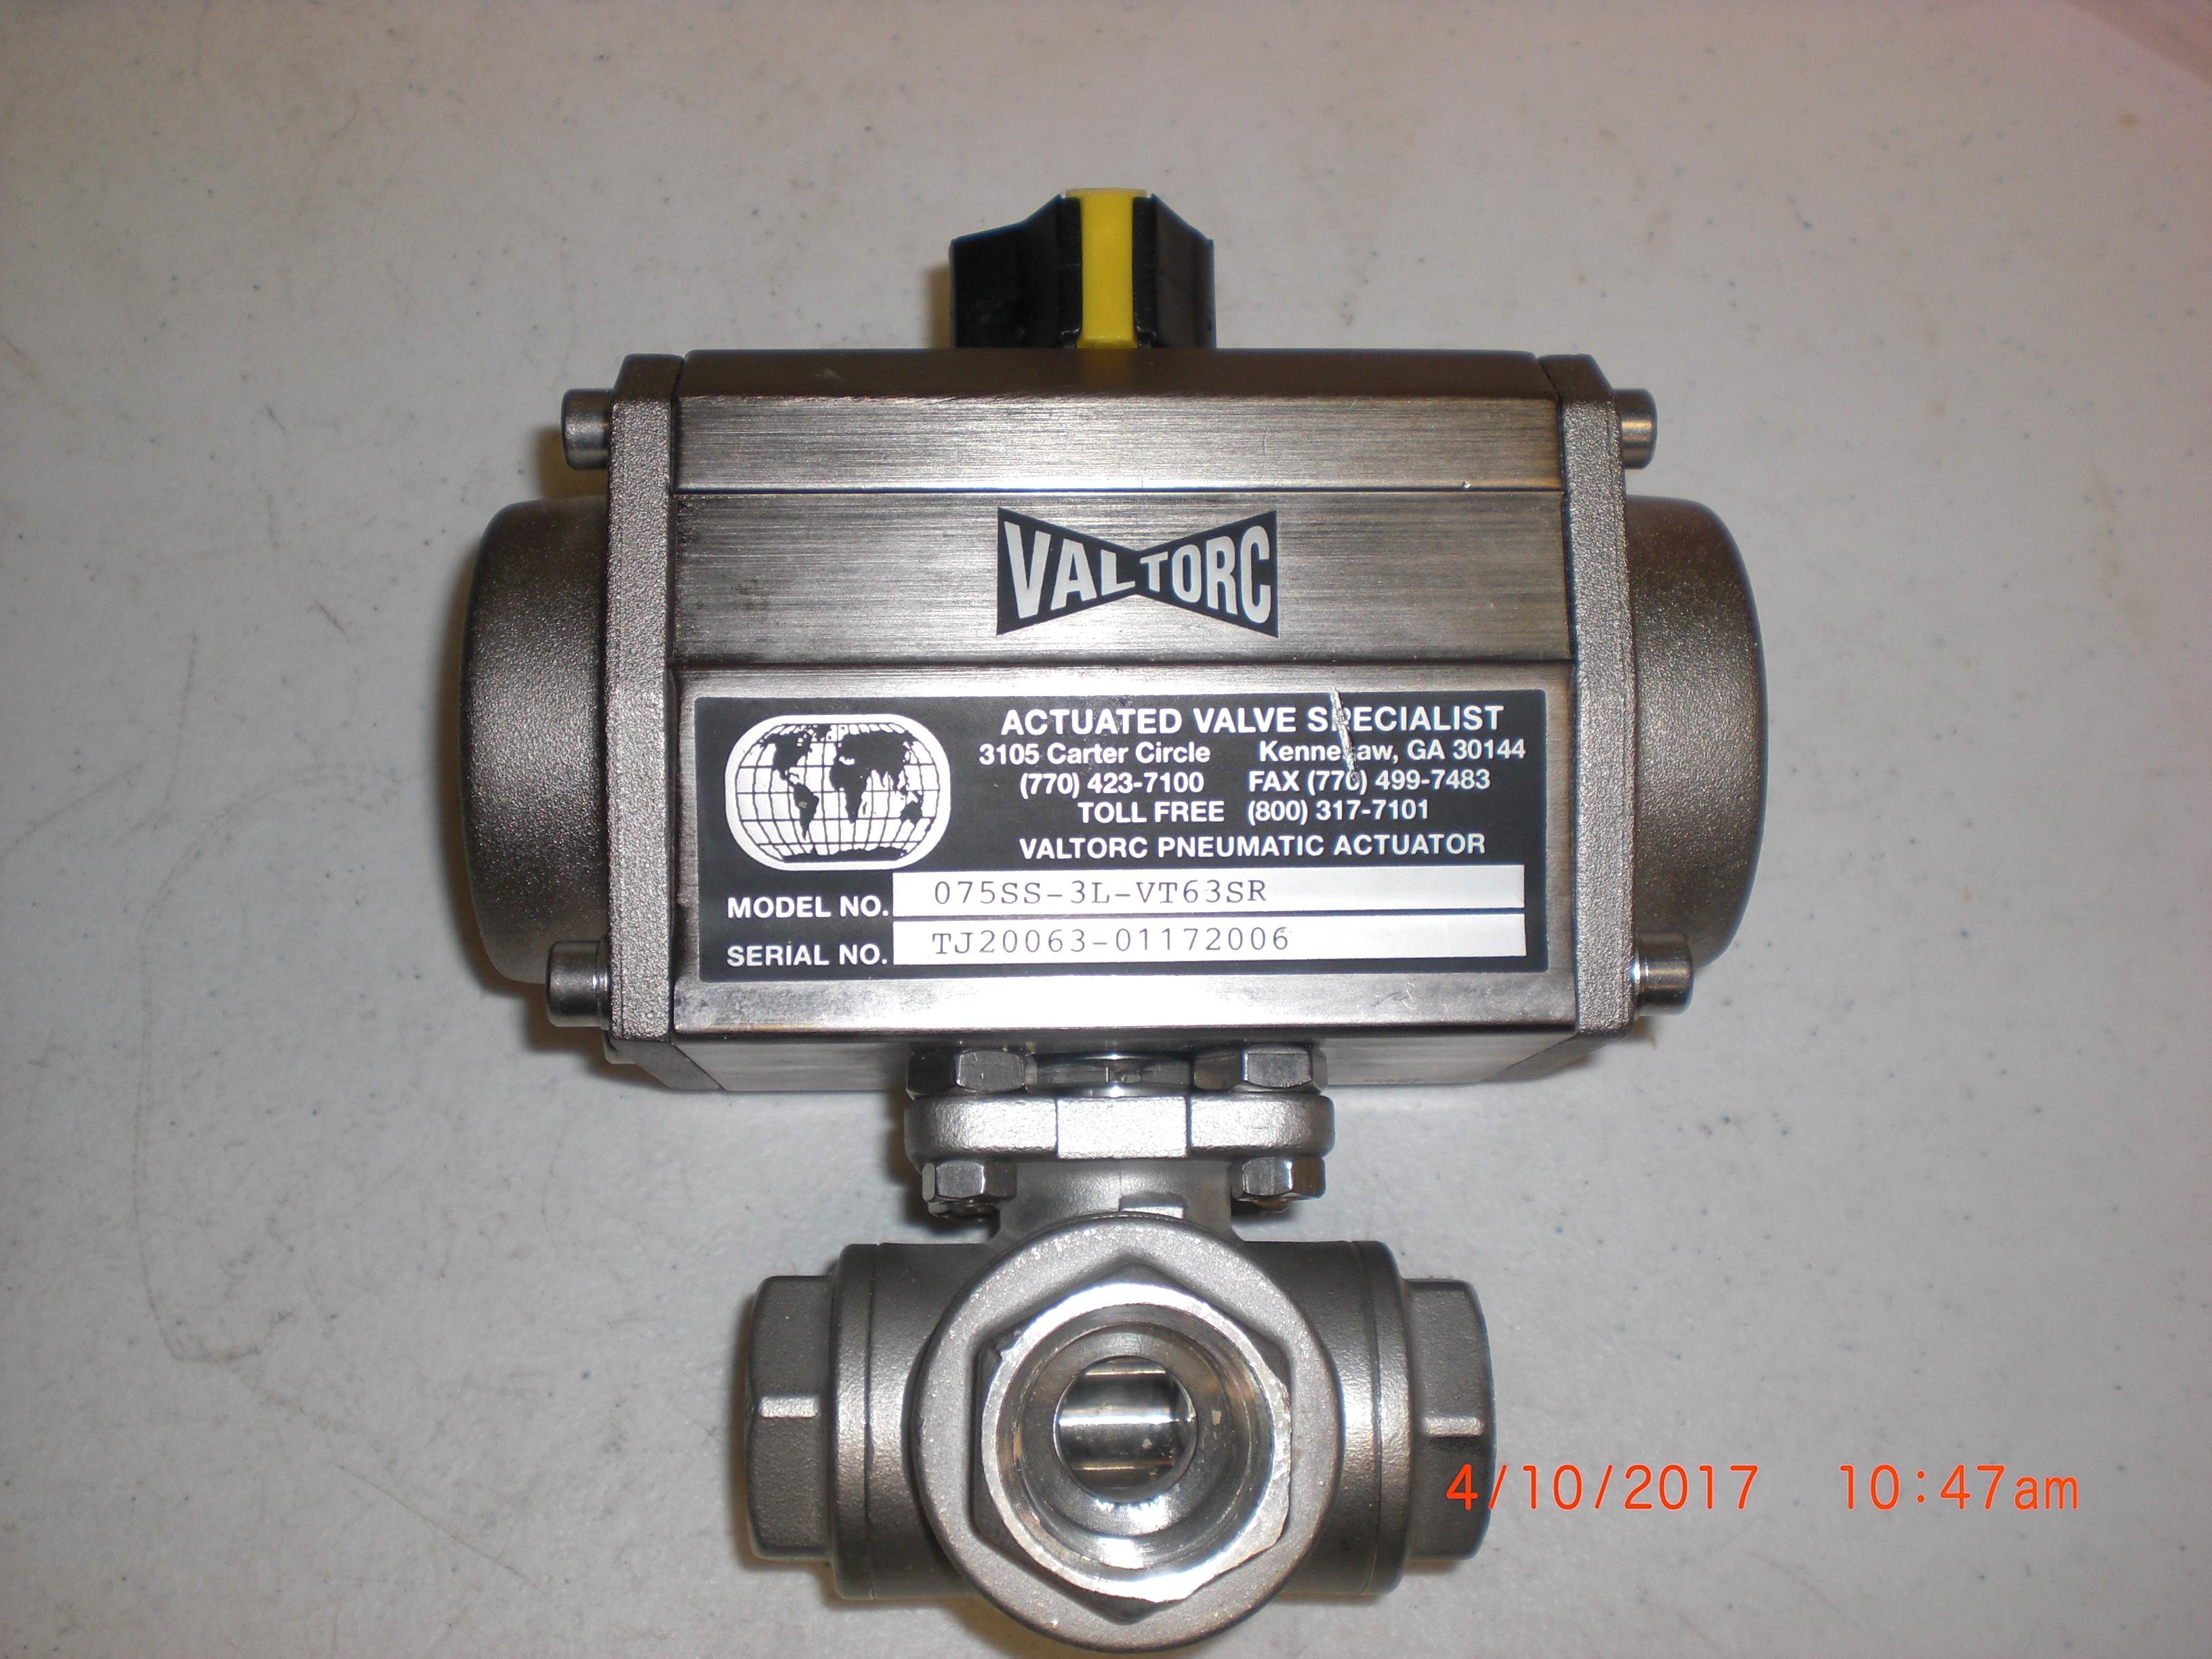 Valve SS Ball 3 way 3/4 FPT  SS Pneumatic actuator  VALTORC 075SS-3L-VT63SR